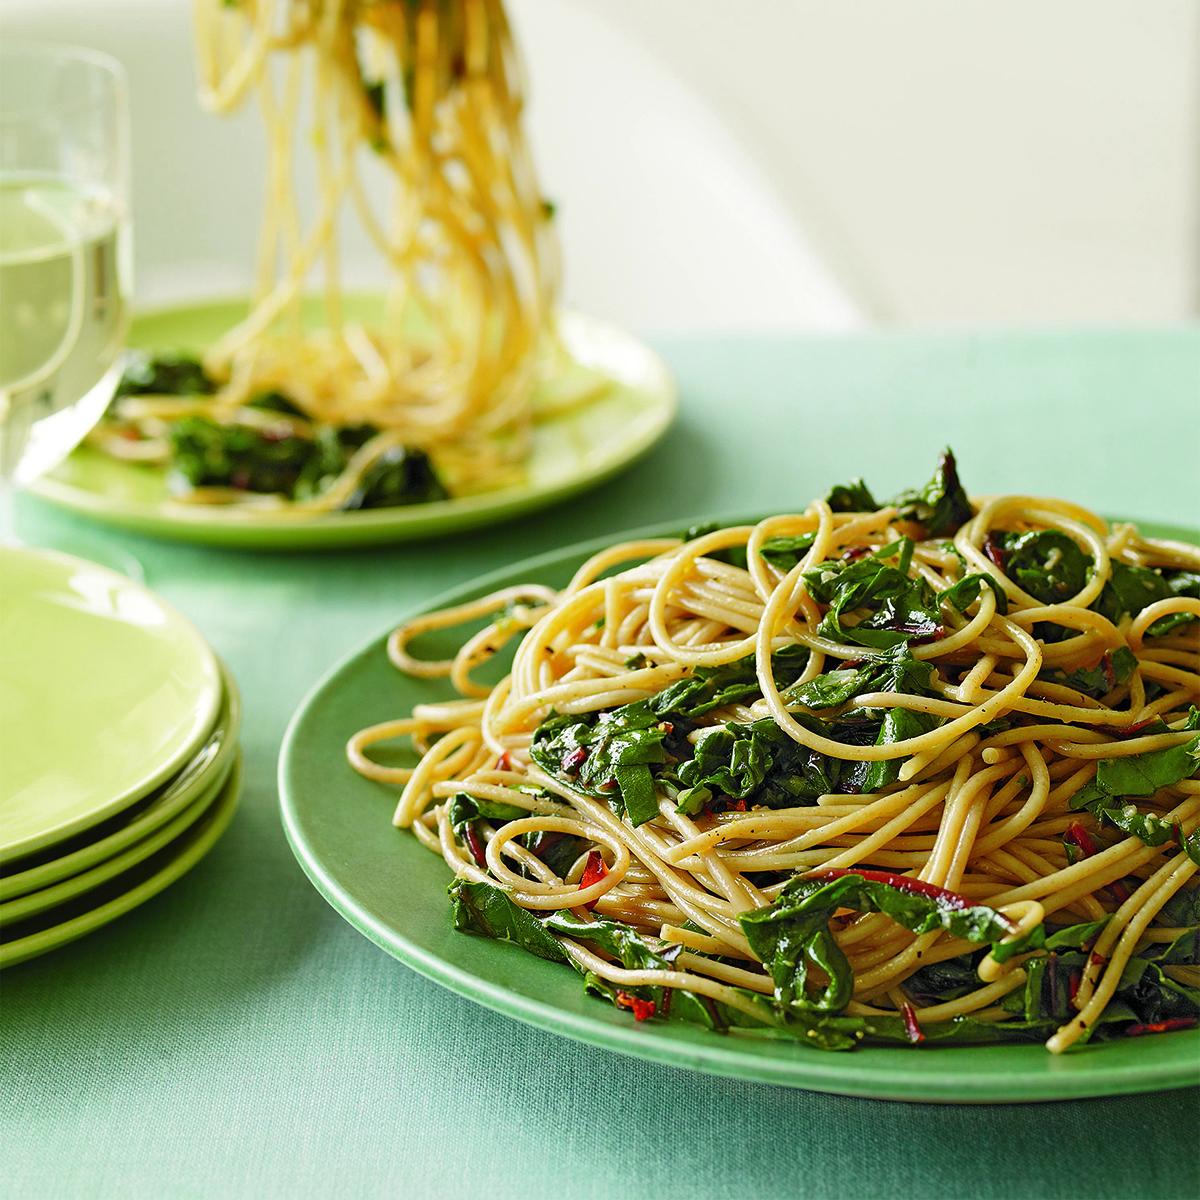 garlic-and-oil-spaghetti-with-greens-2b8c7b2a